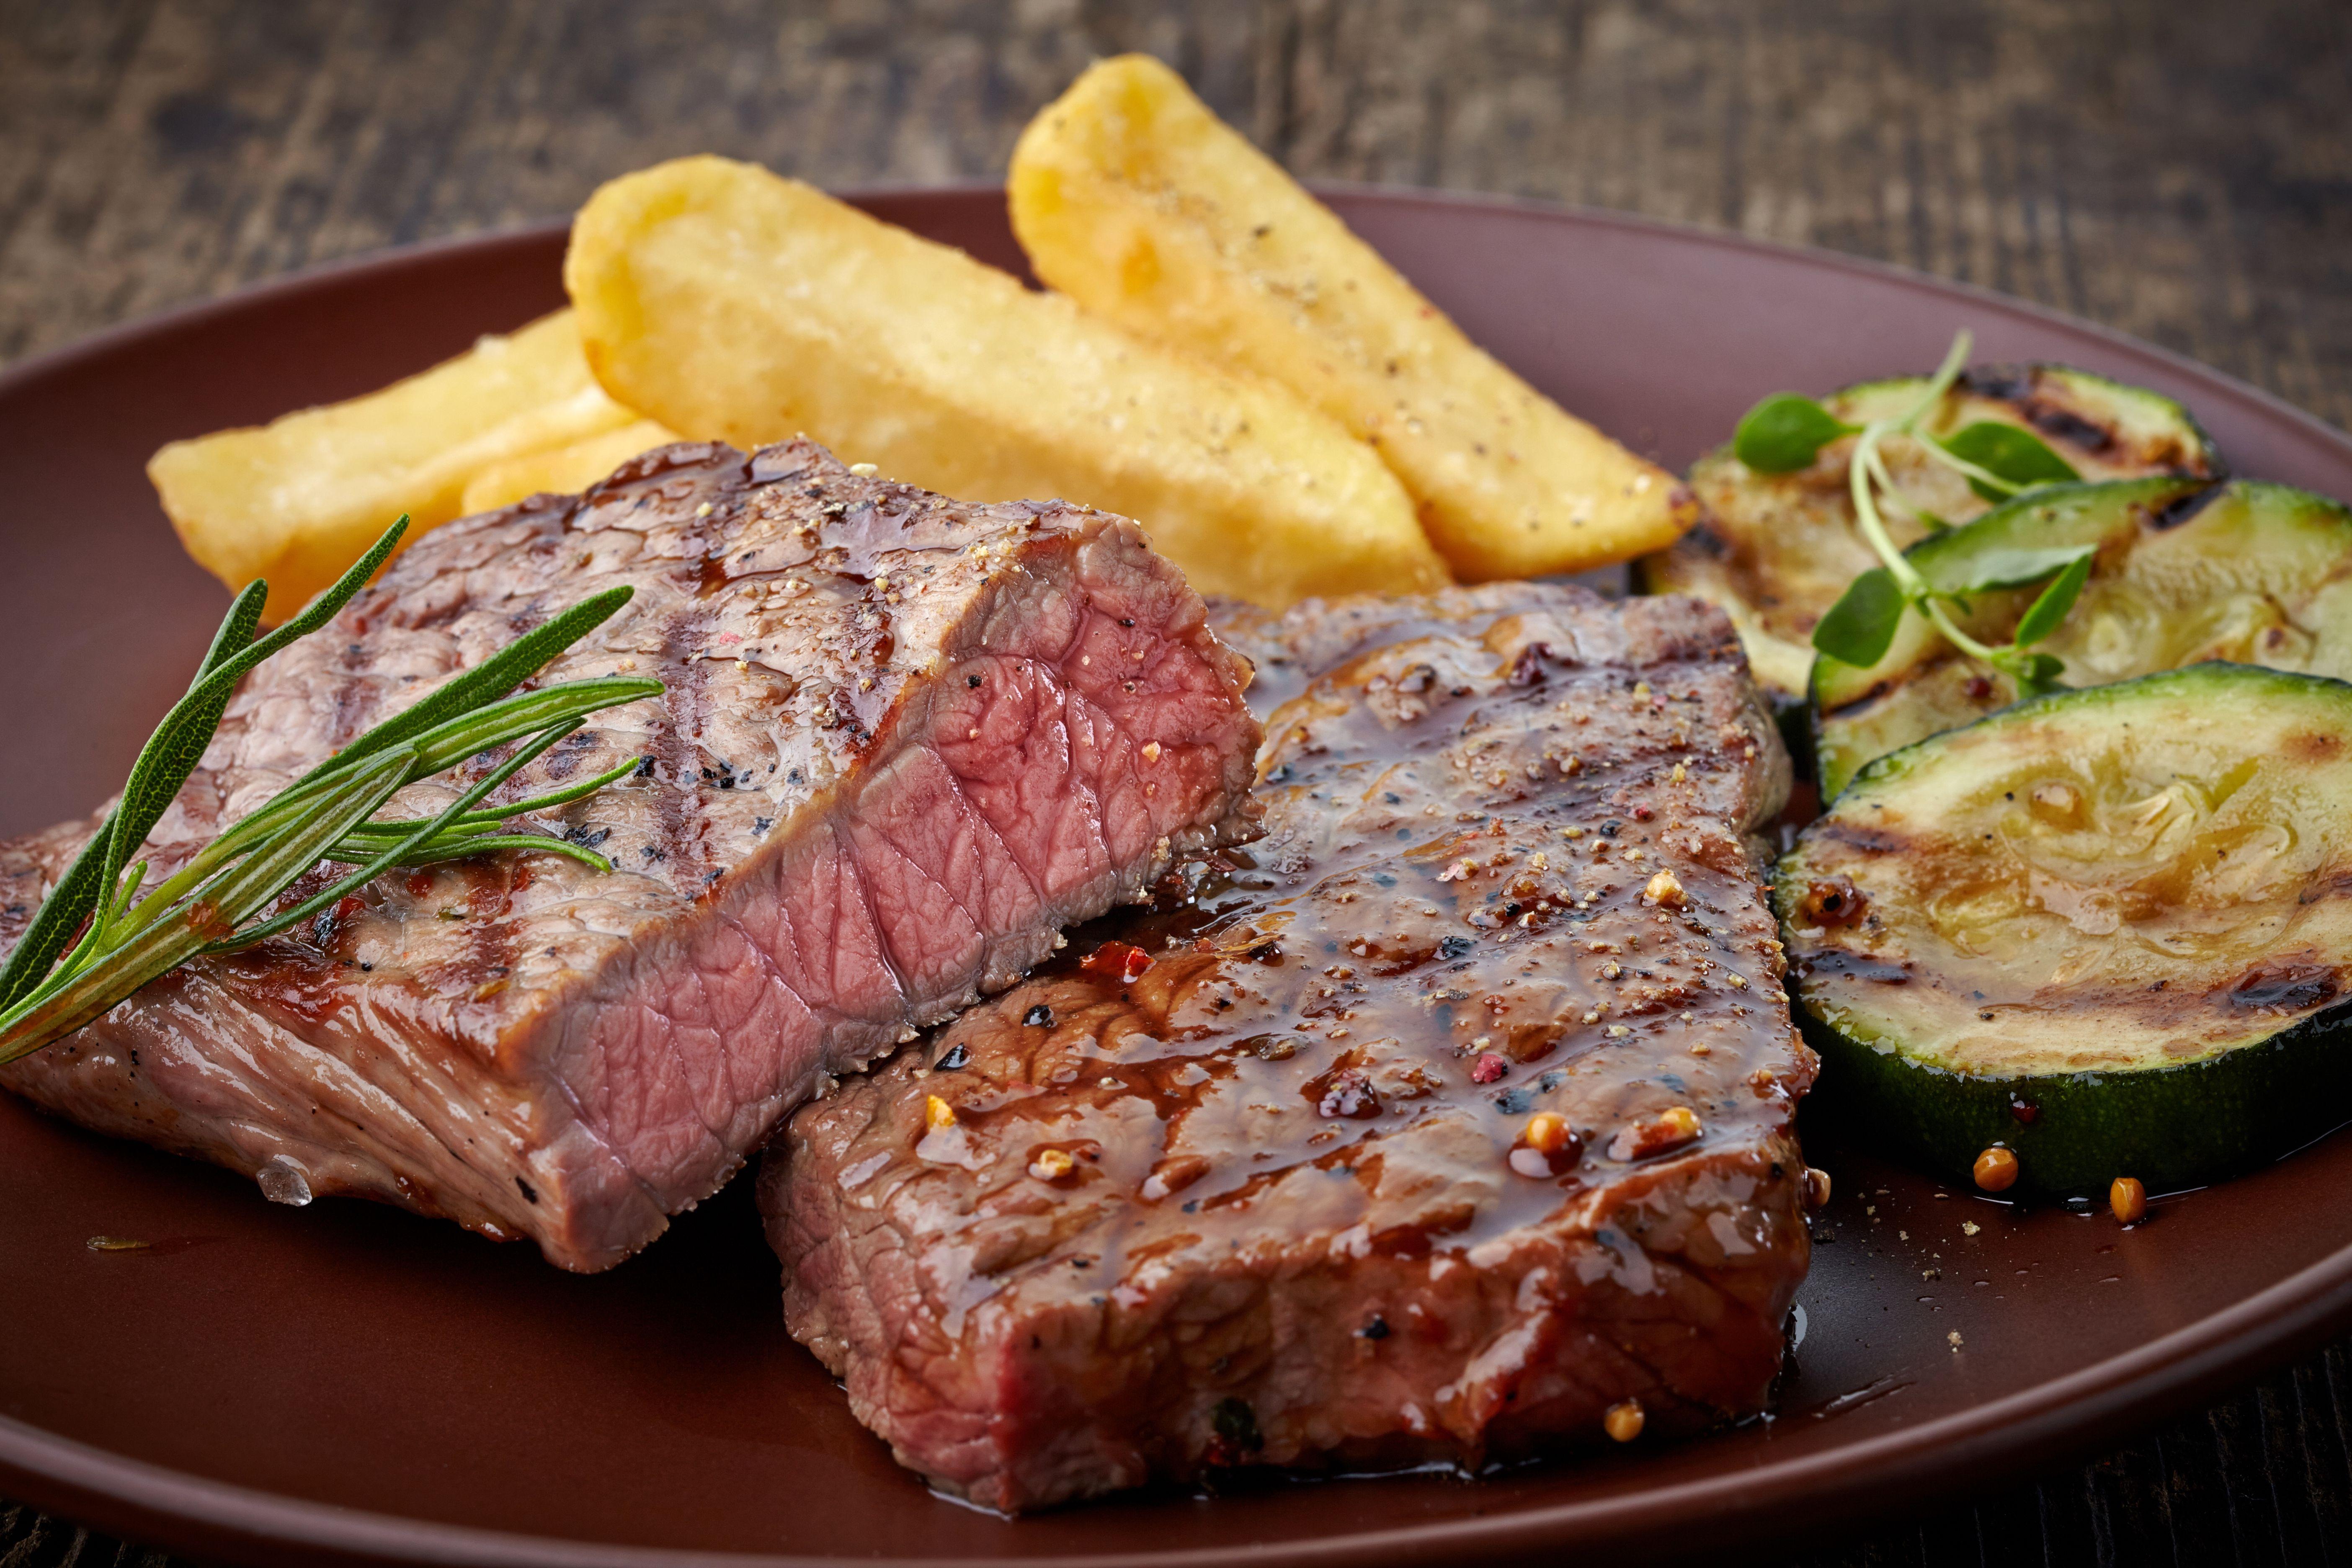 Sabrosas carnes a tu gusto